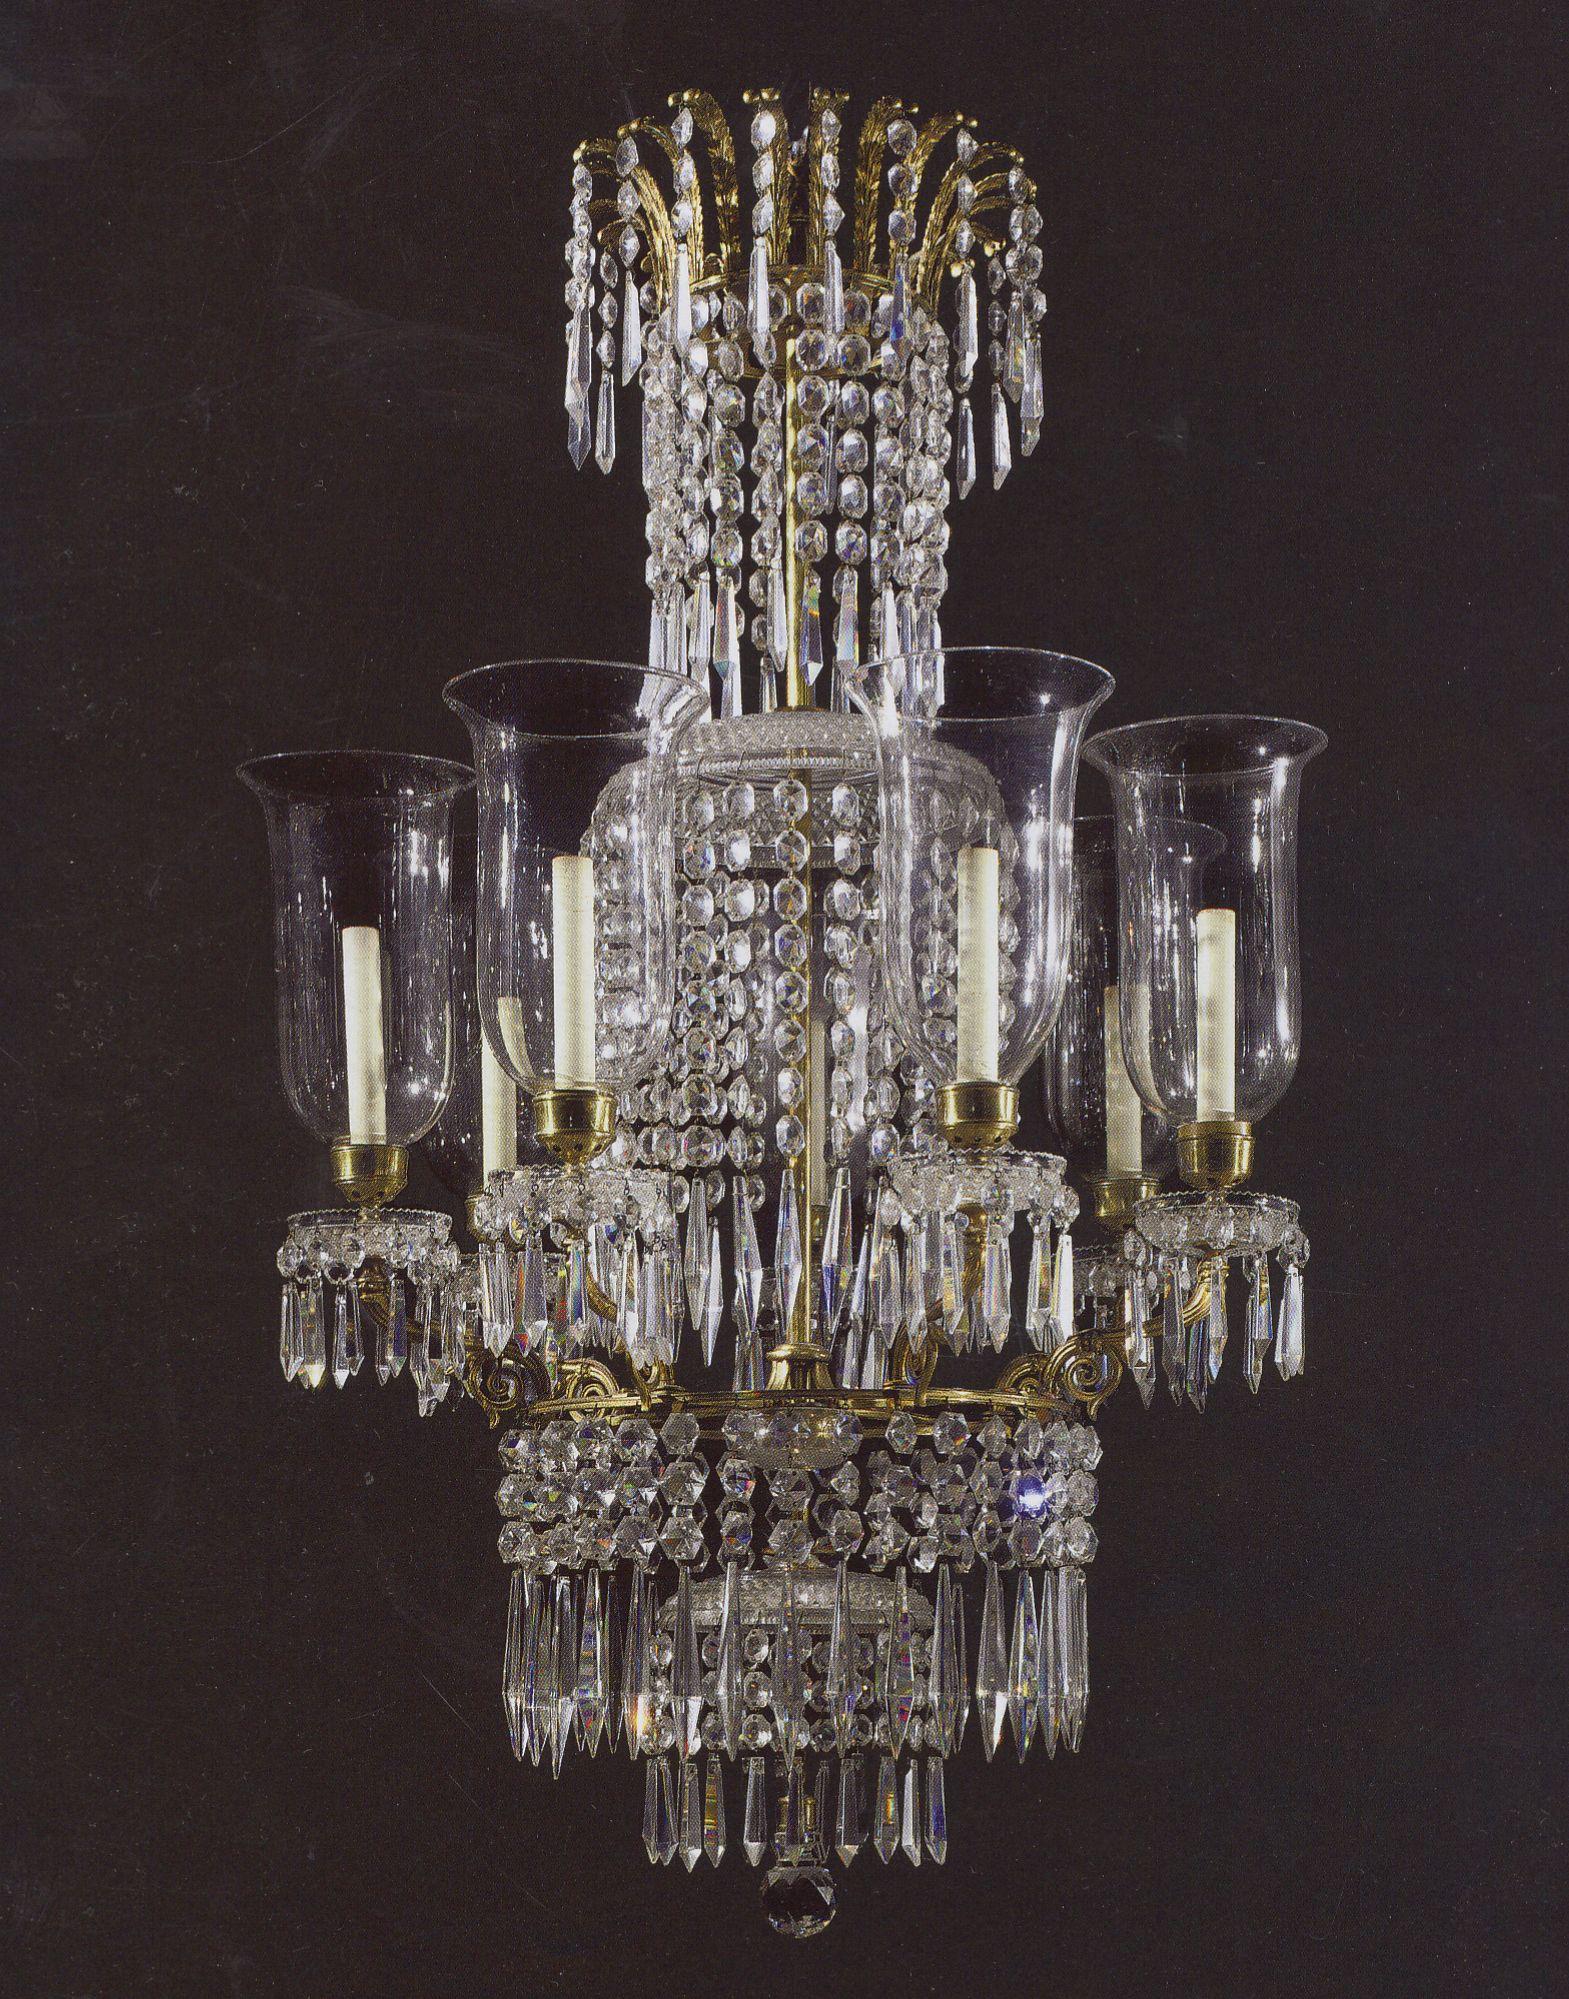 Regency ormolu and cut glass seven light chandelier english cerca regency ormolu and cut glass seven light chandelier english cerca 1810 exhibitor arubaitofo Gallery